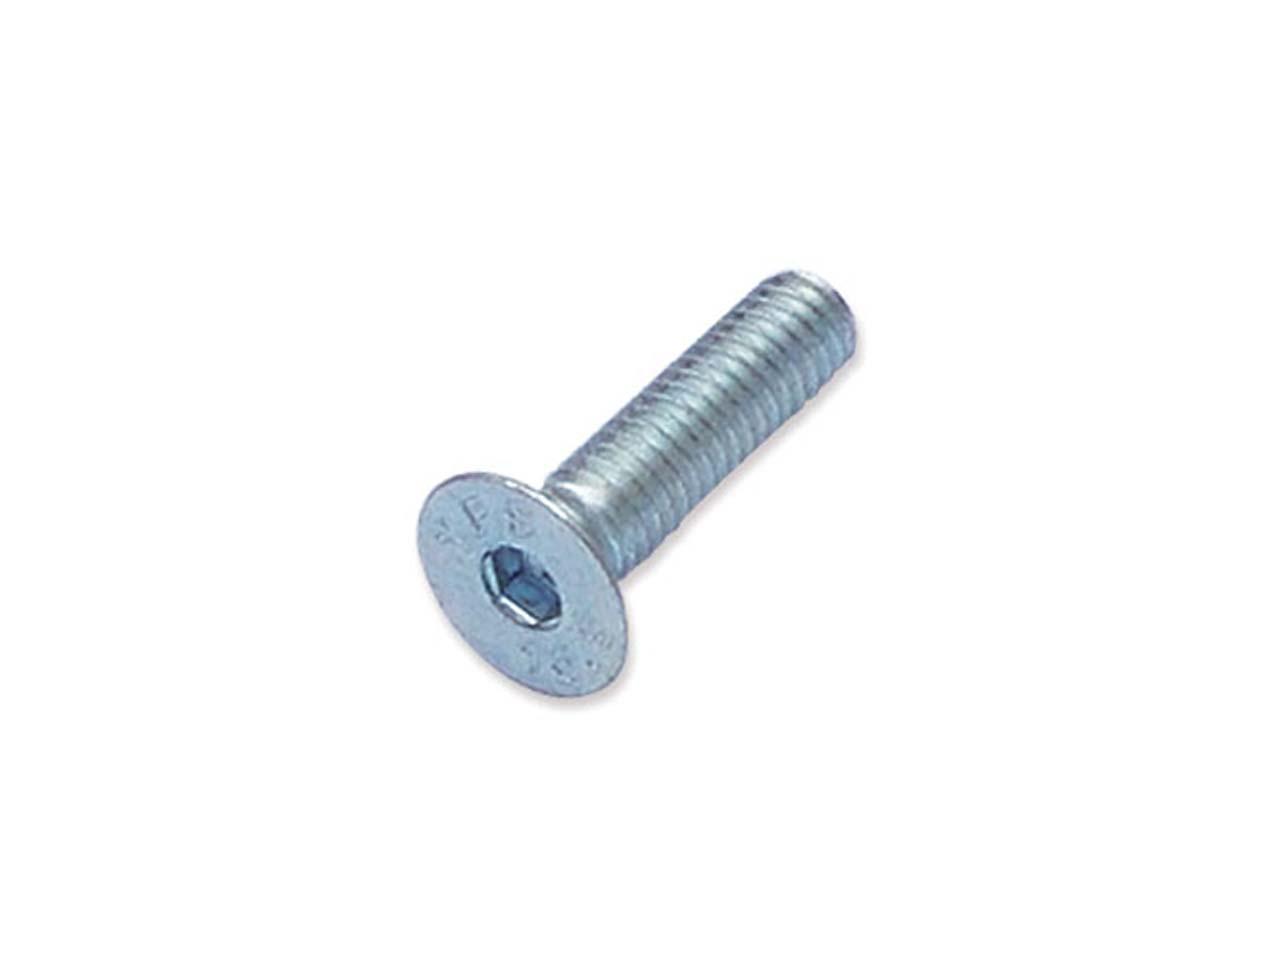 Trend WPT4060A Grub screw M6 x 8mm T4